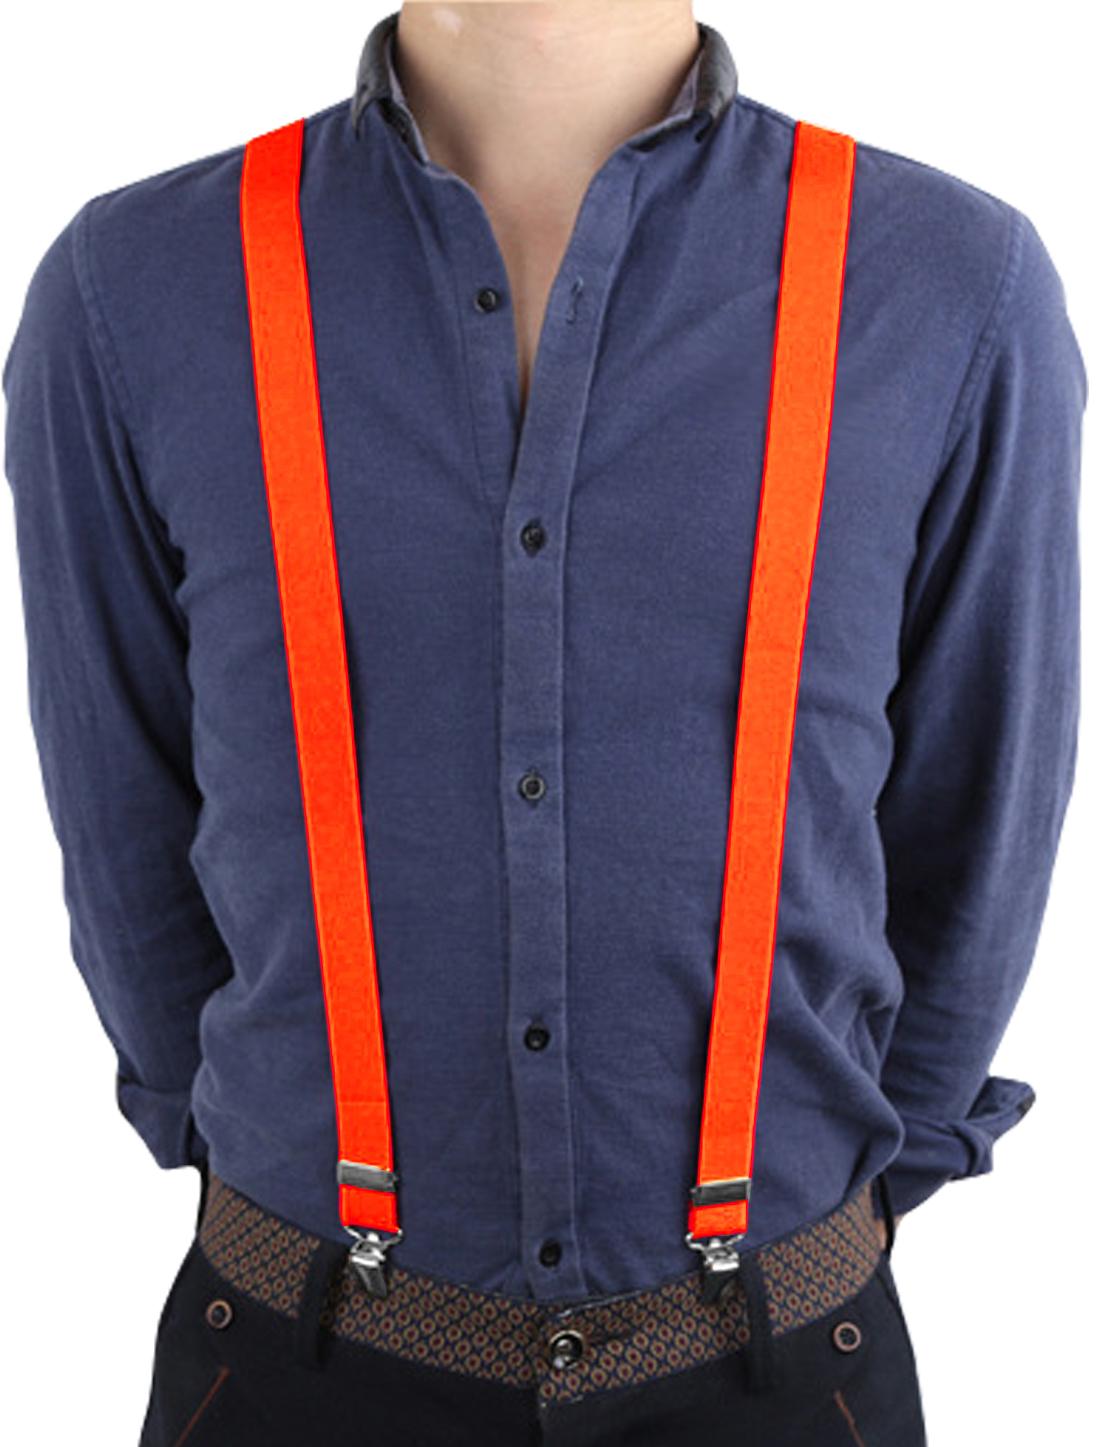 Unisex Y Shape Back Design Elastic Adjustable Suspenders Orange